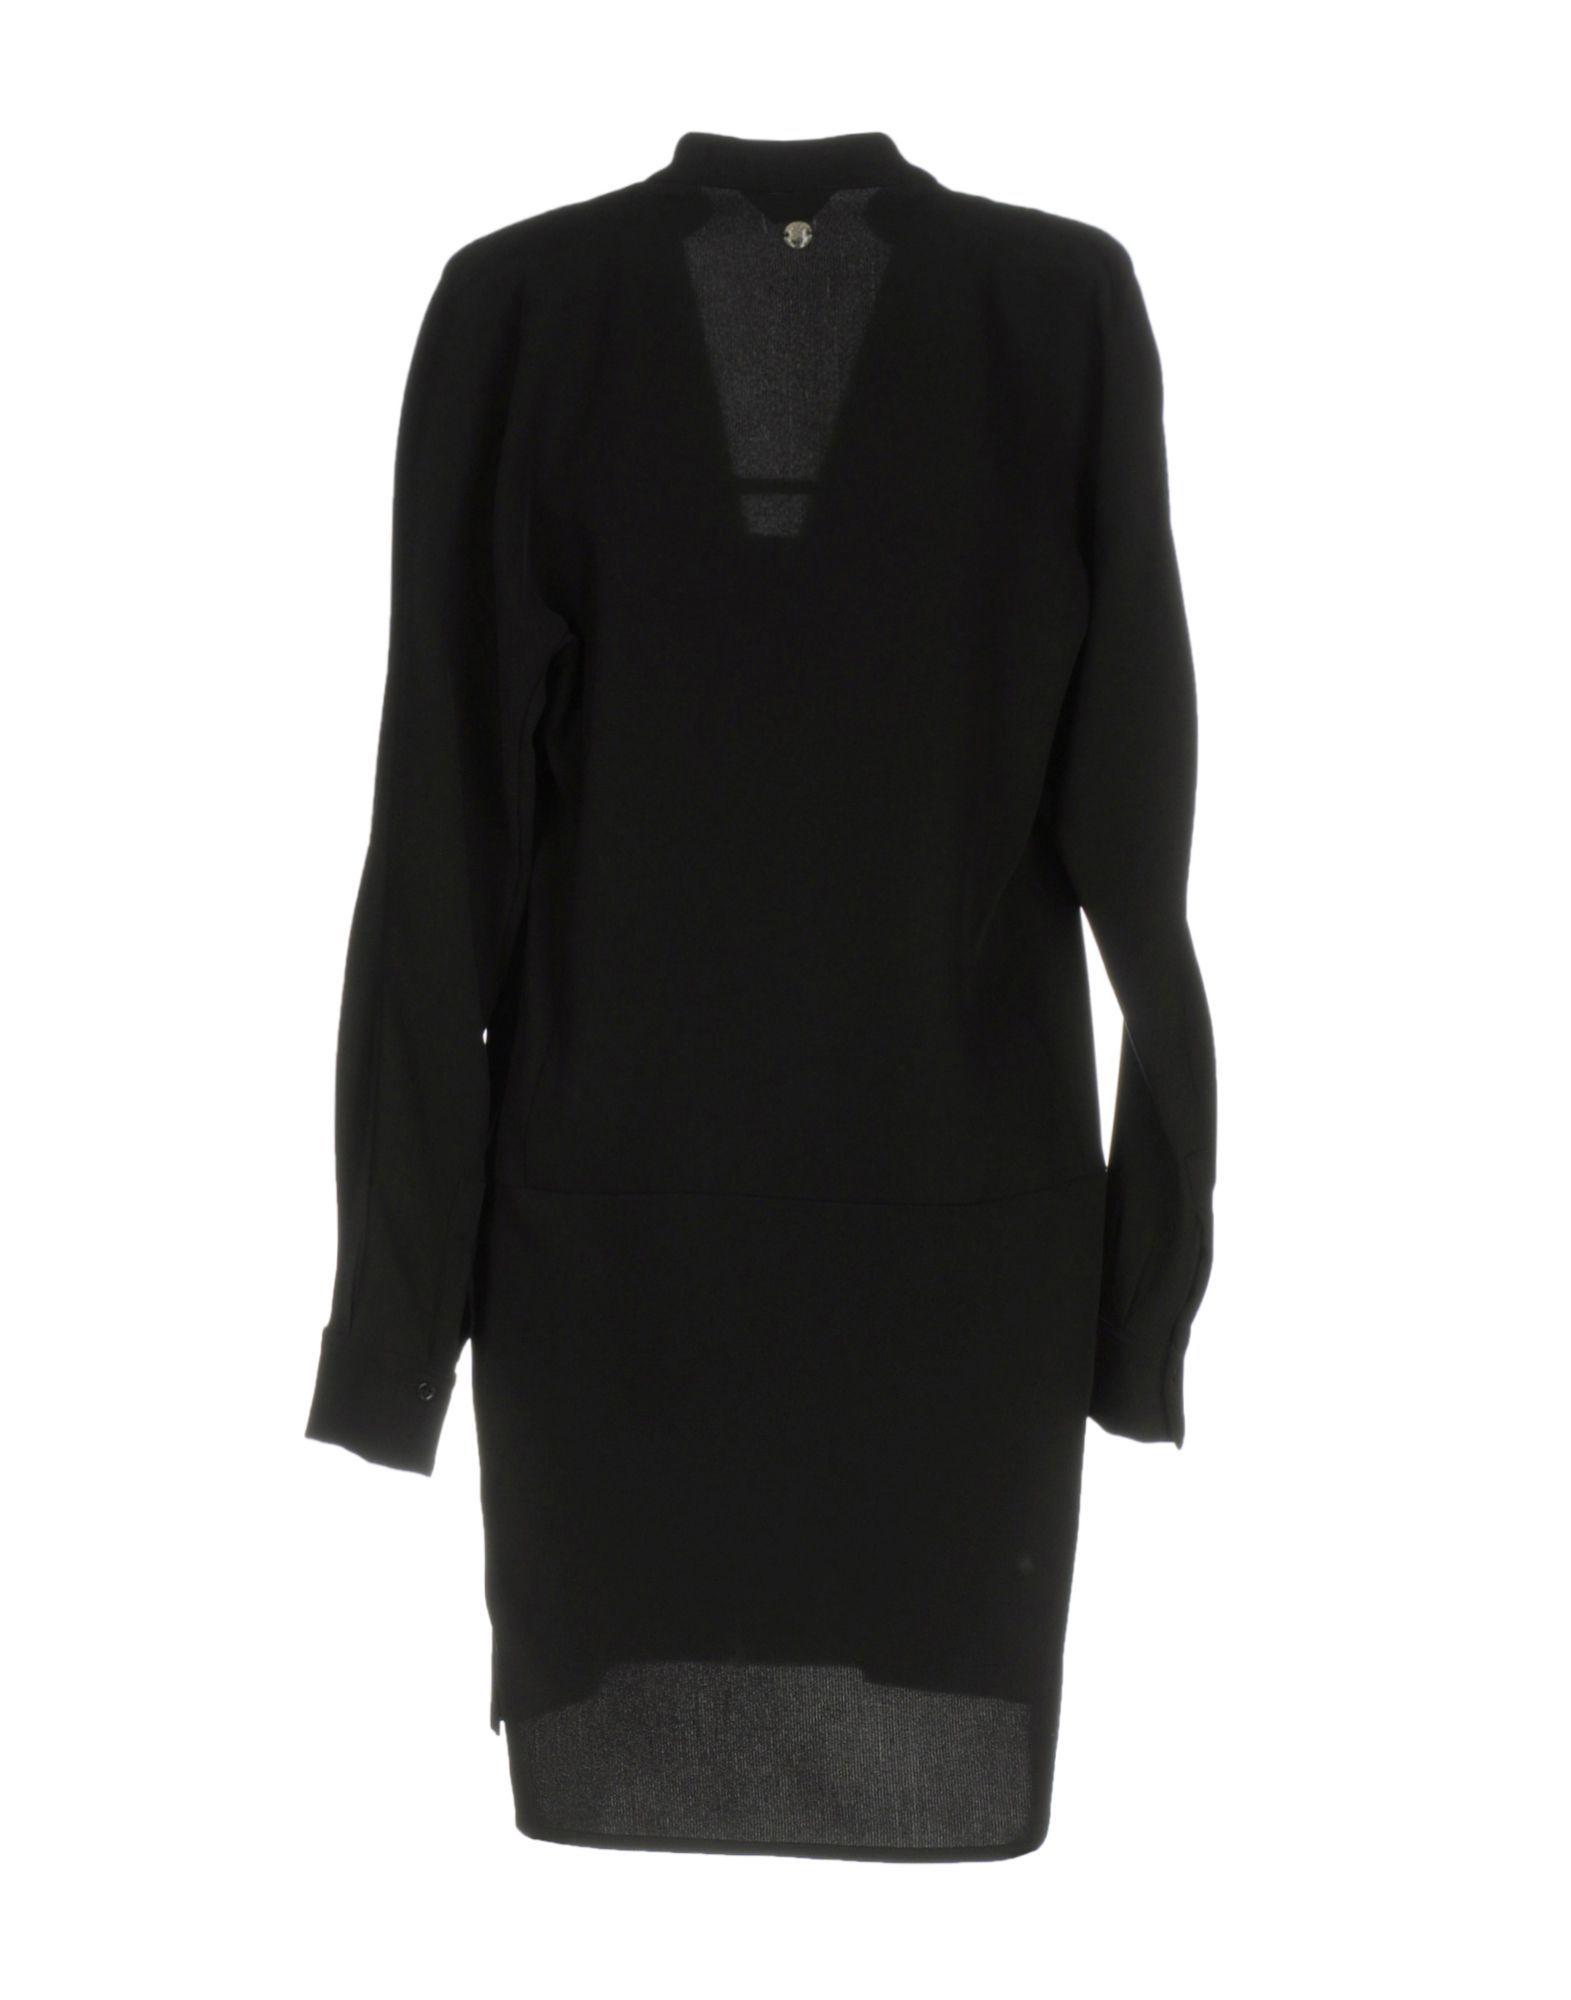 Liu Jo Black Long Sleeve Dress